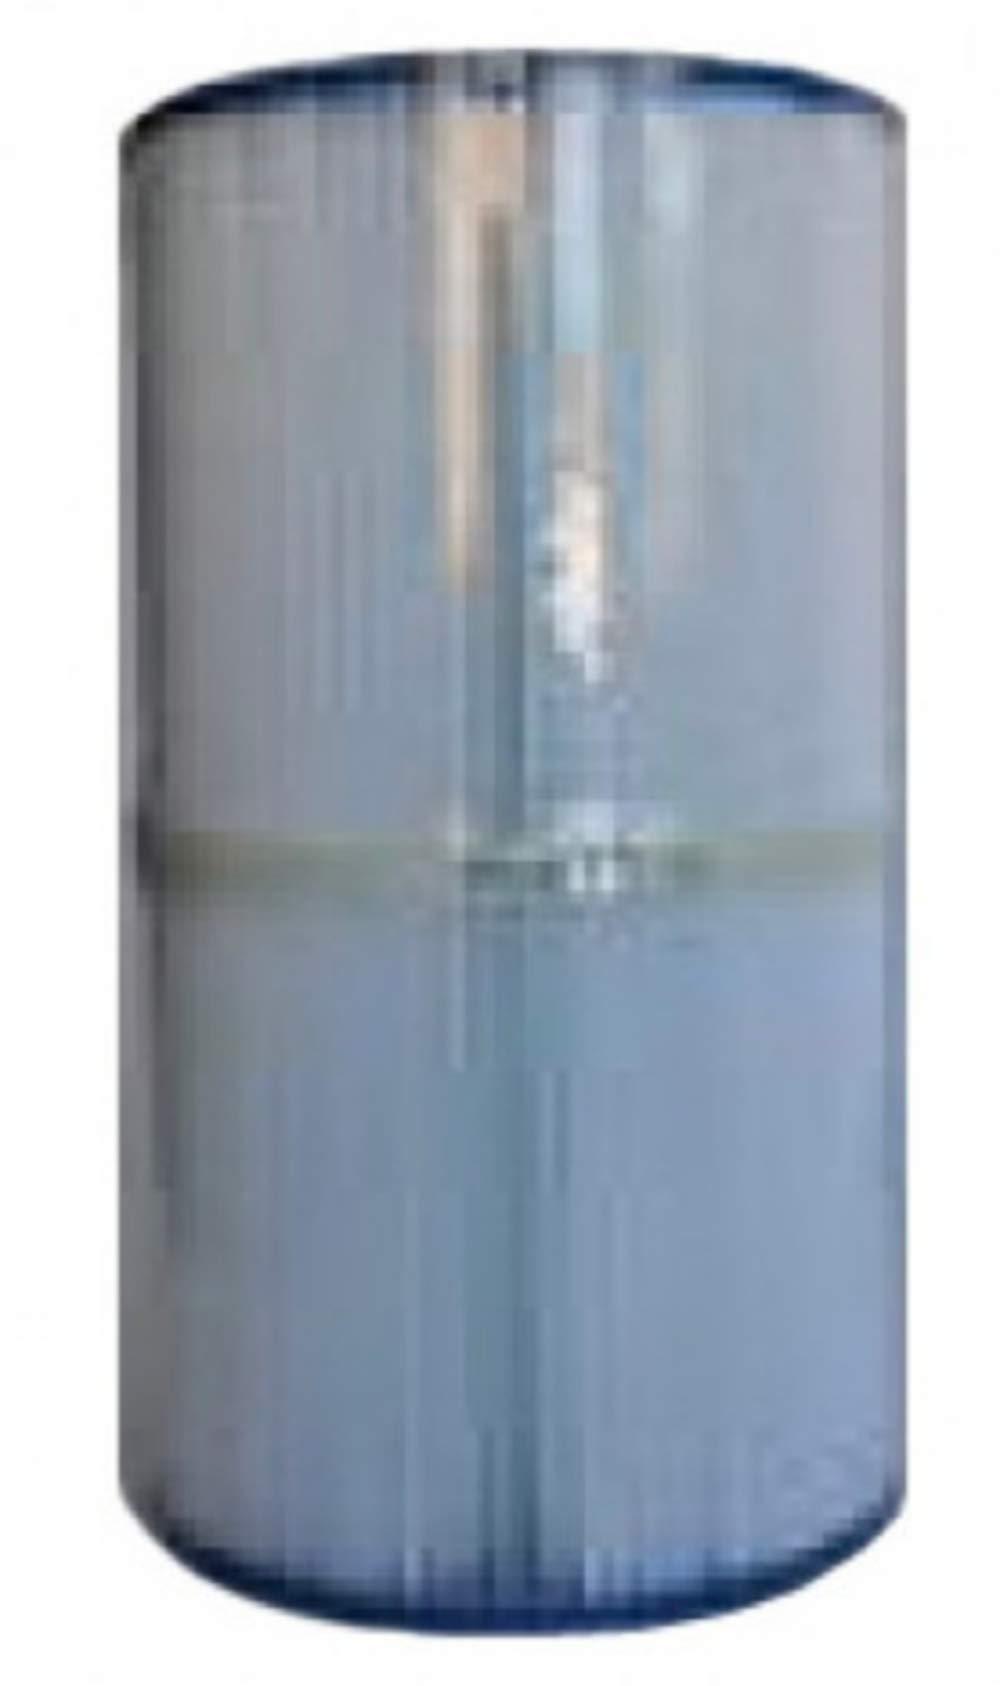 Watkins Hot Spring Solana Replacement Filter - PWK30